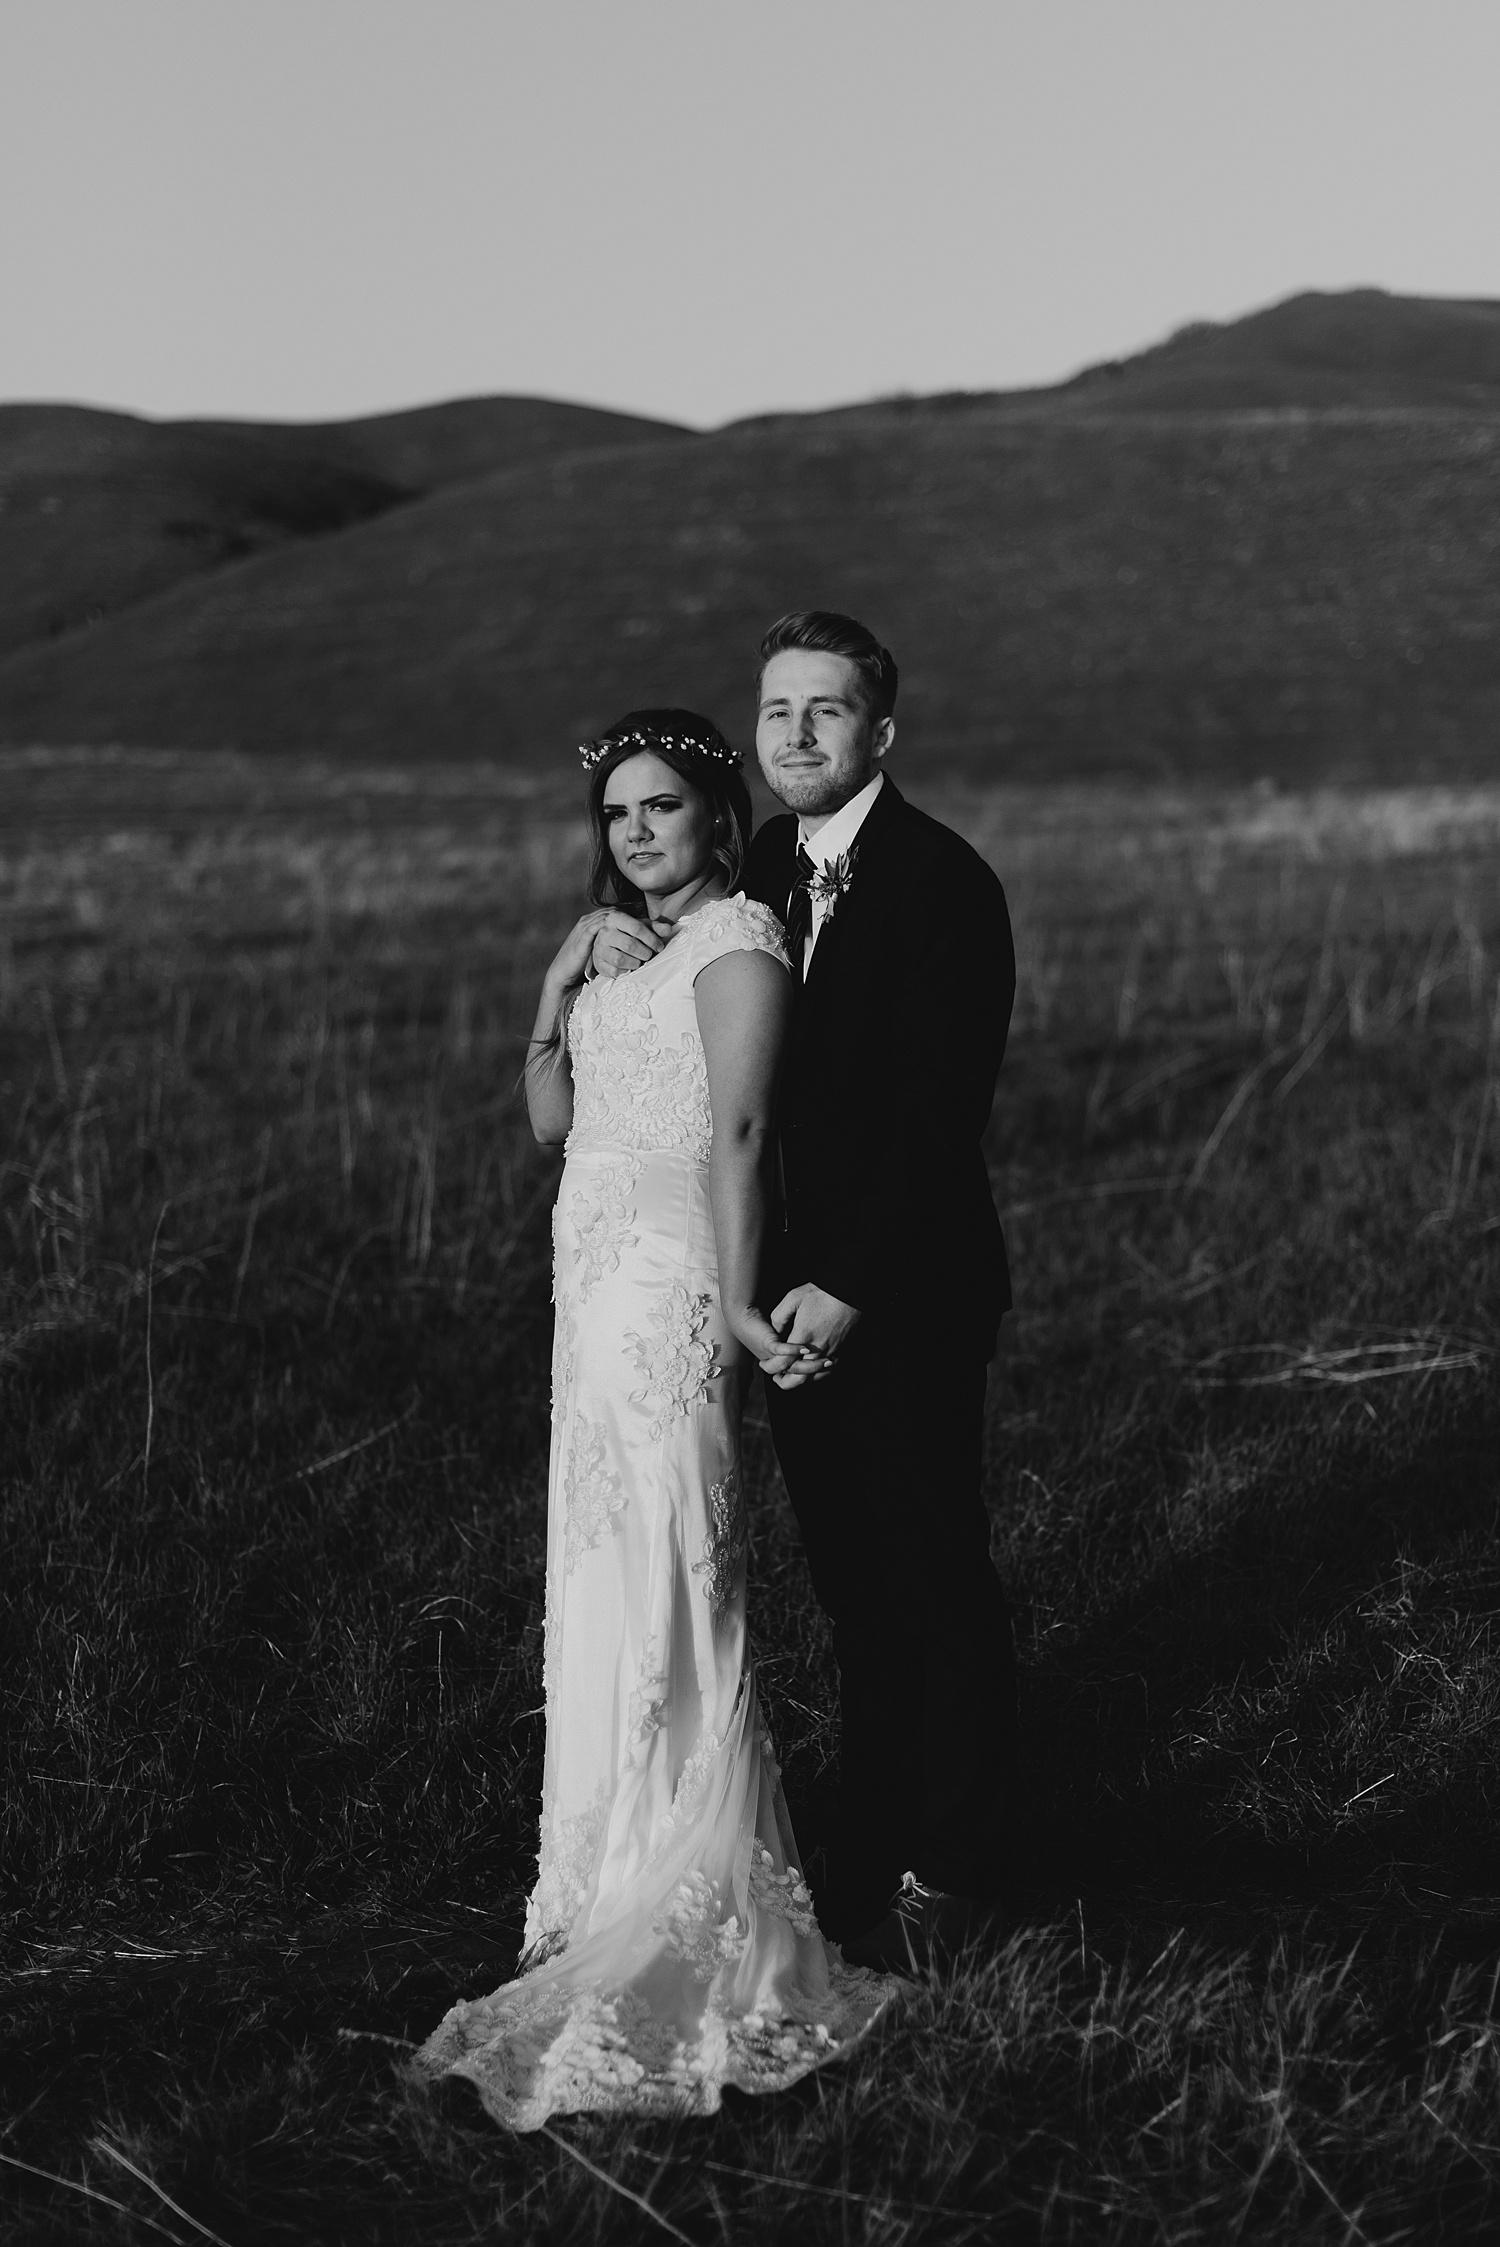 Zandra Barriga Photo - Dallas + Megan Green Hills Bridals_0018.jpg